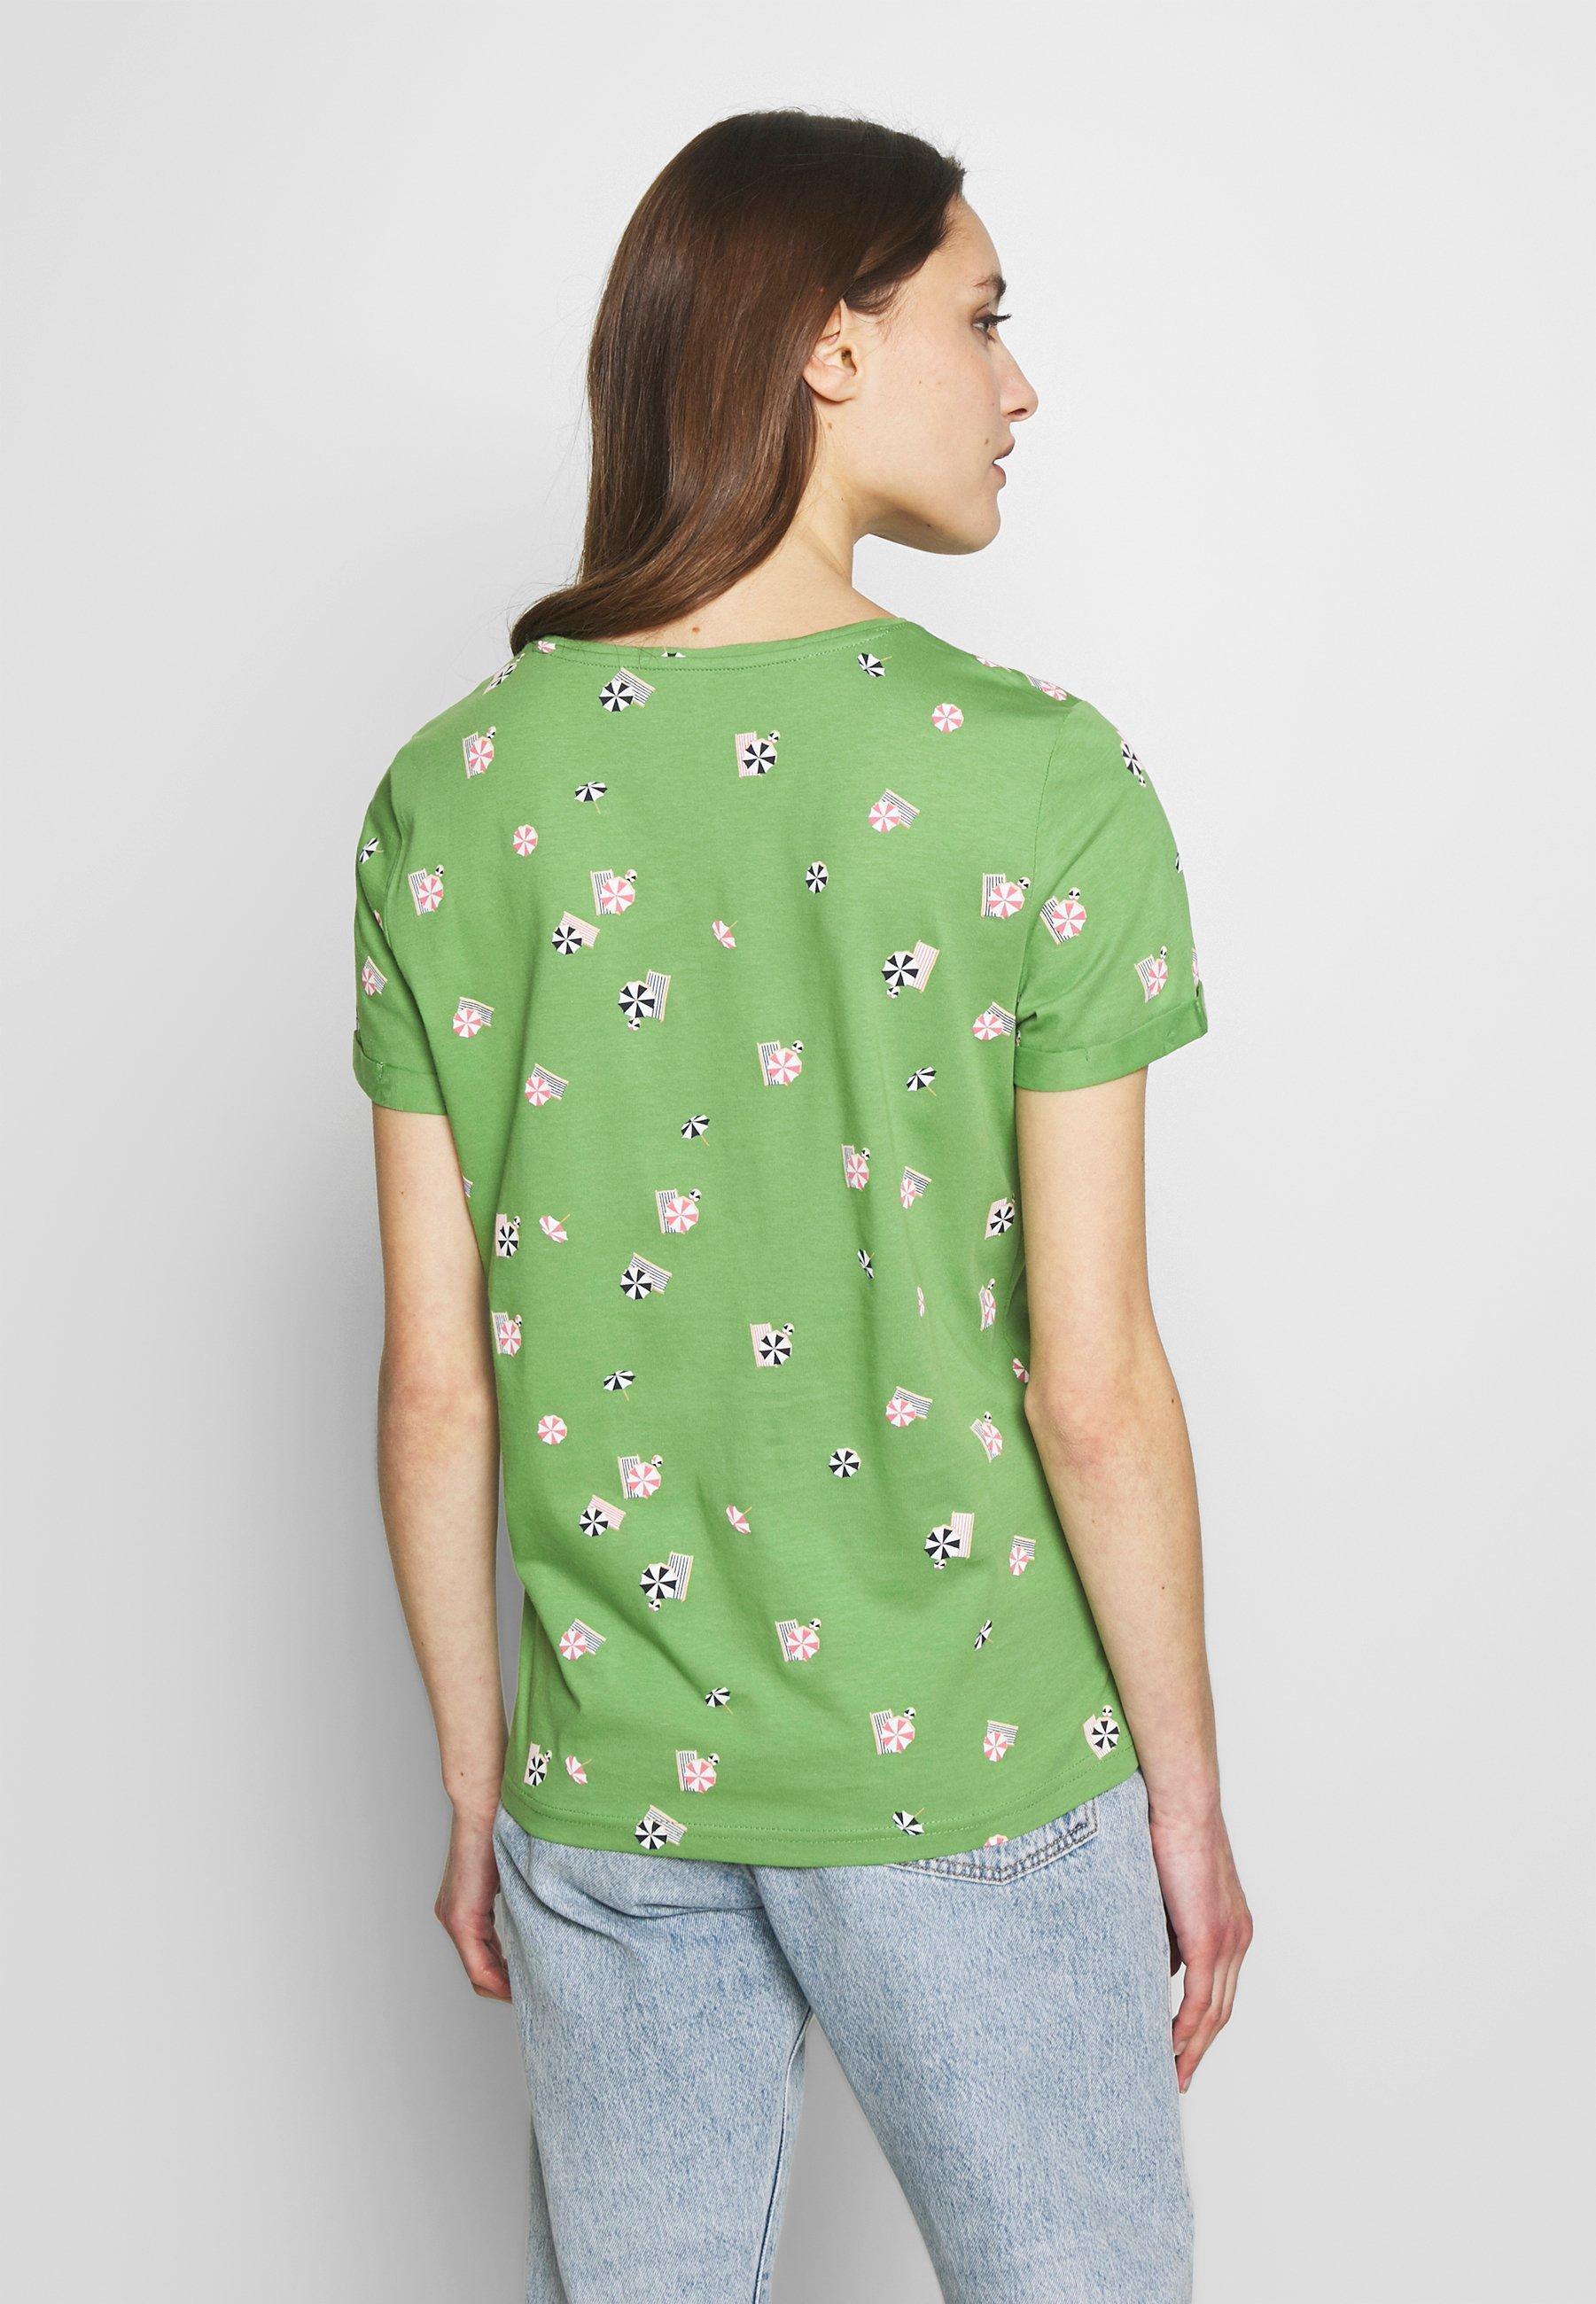 TOM TAILOR CREW NECK - T-shirts med print - green parasol design green